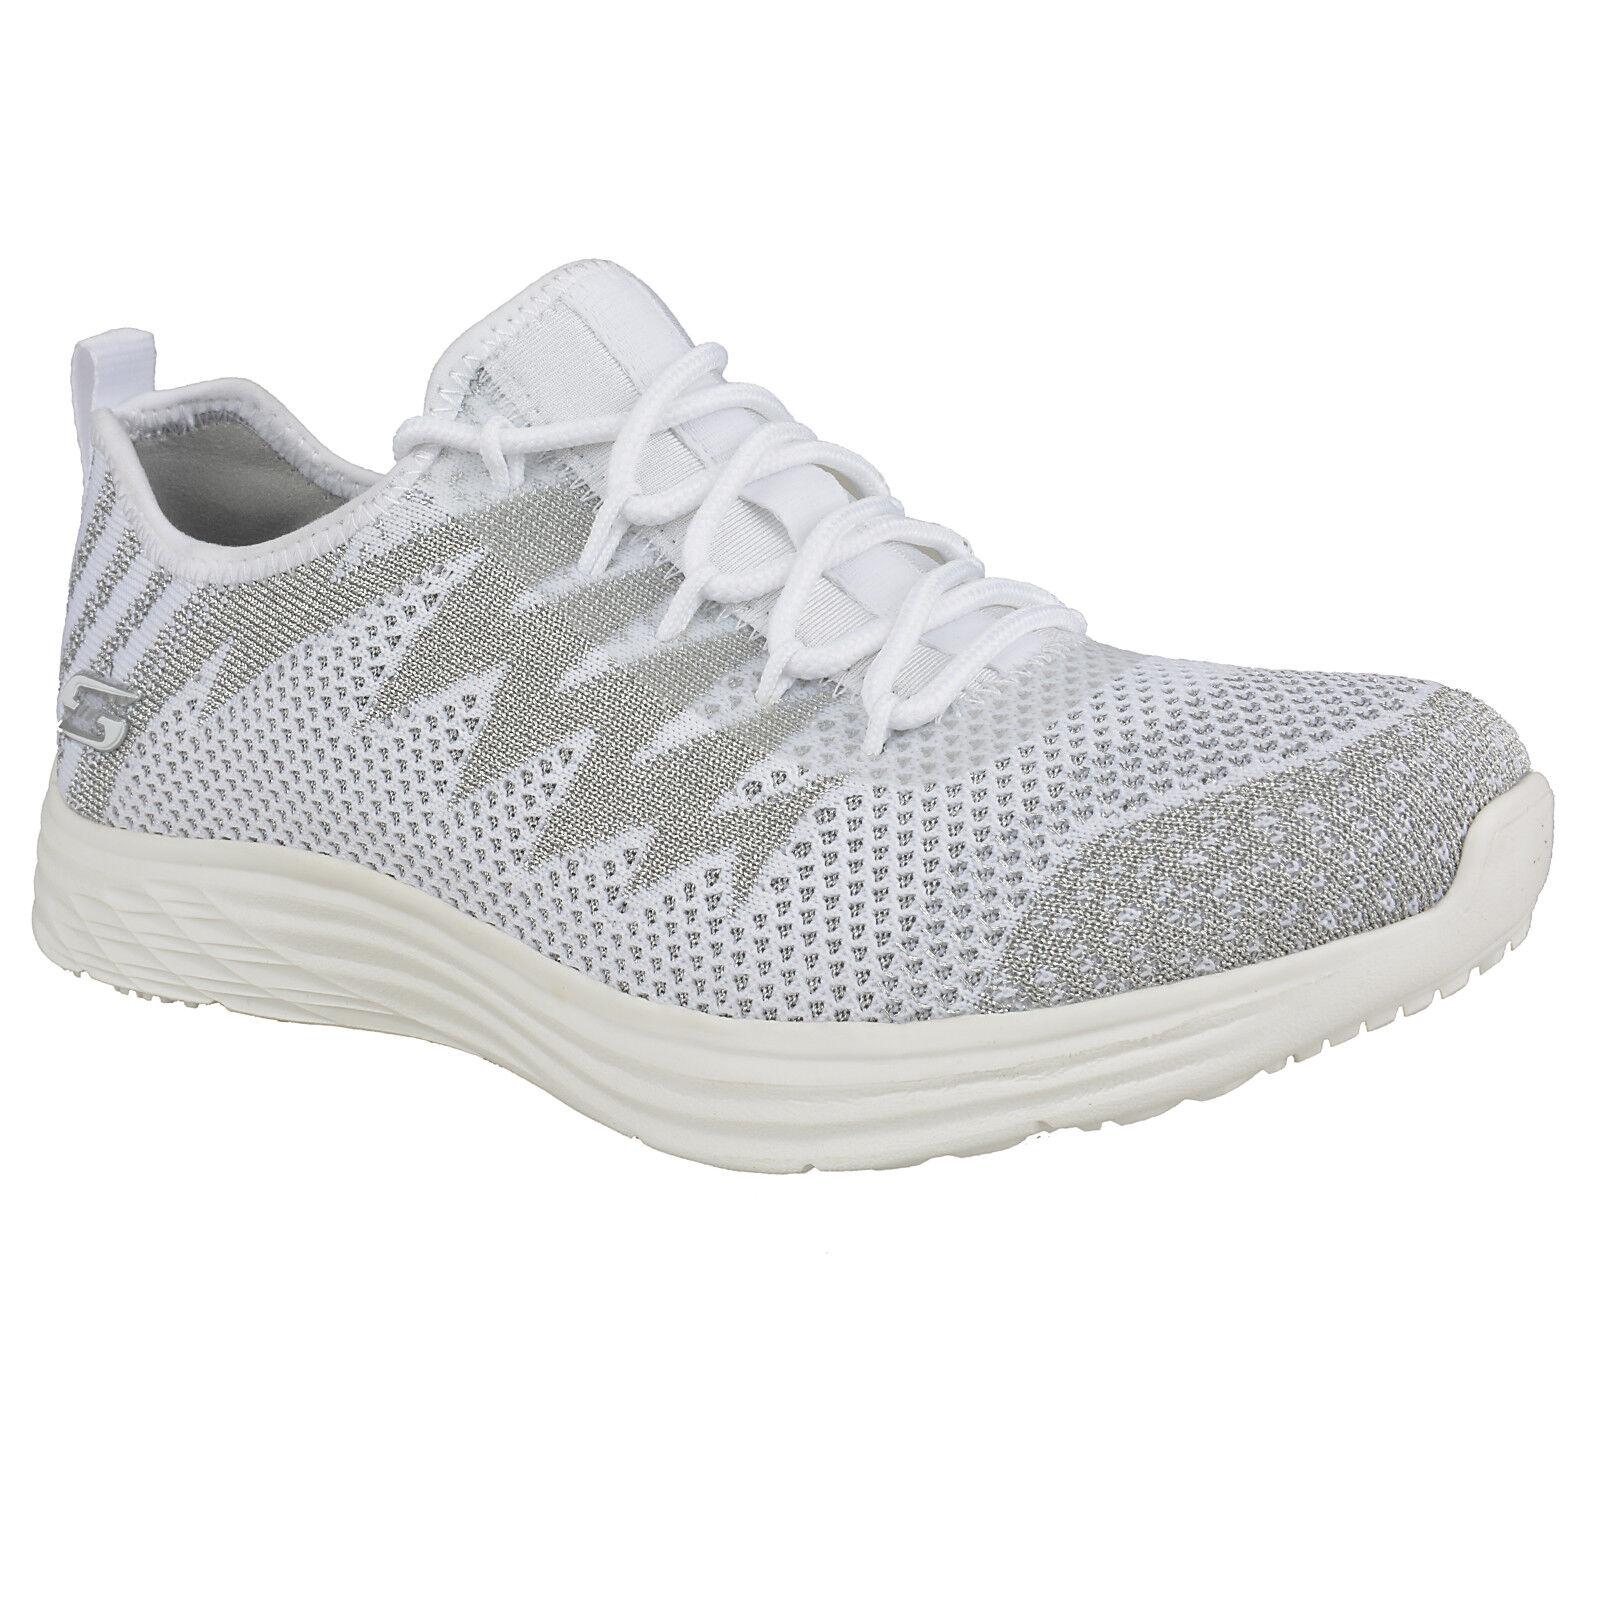 NEU SKECHERS DAMEN Sneakers Freizeitschuhe runners BOBS